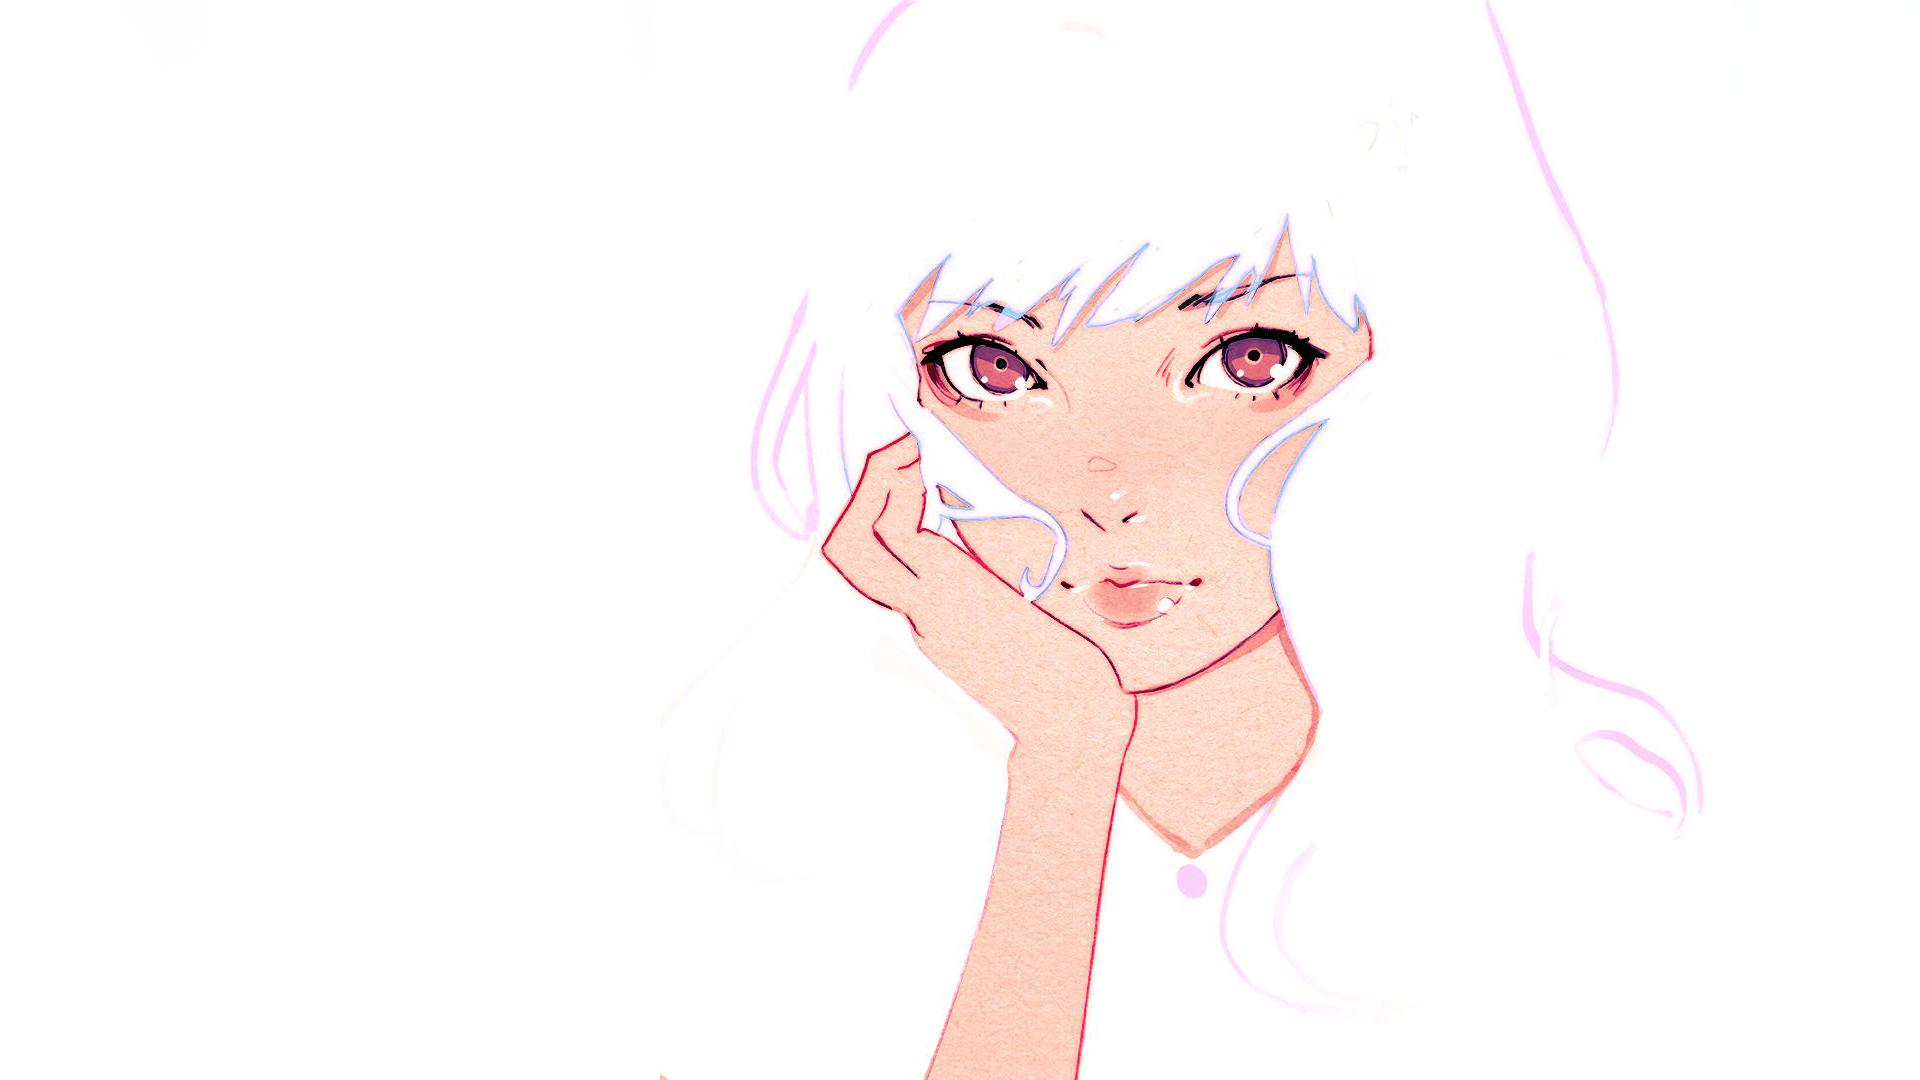 Wallpaper : Face, Drawing, Illustration, Anime, Artwork